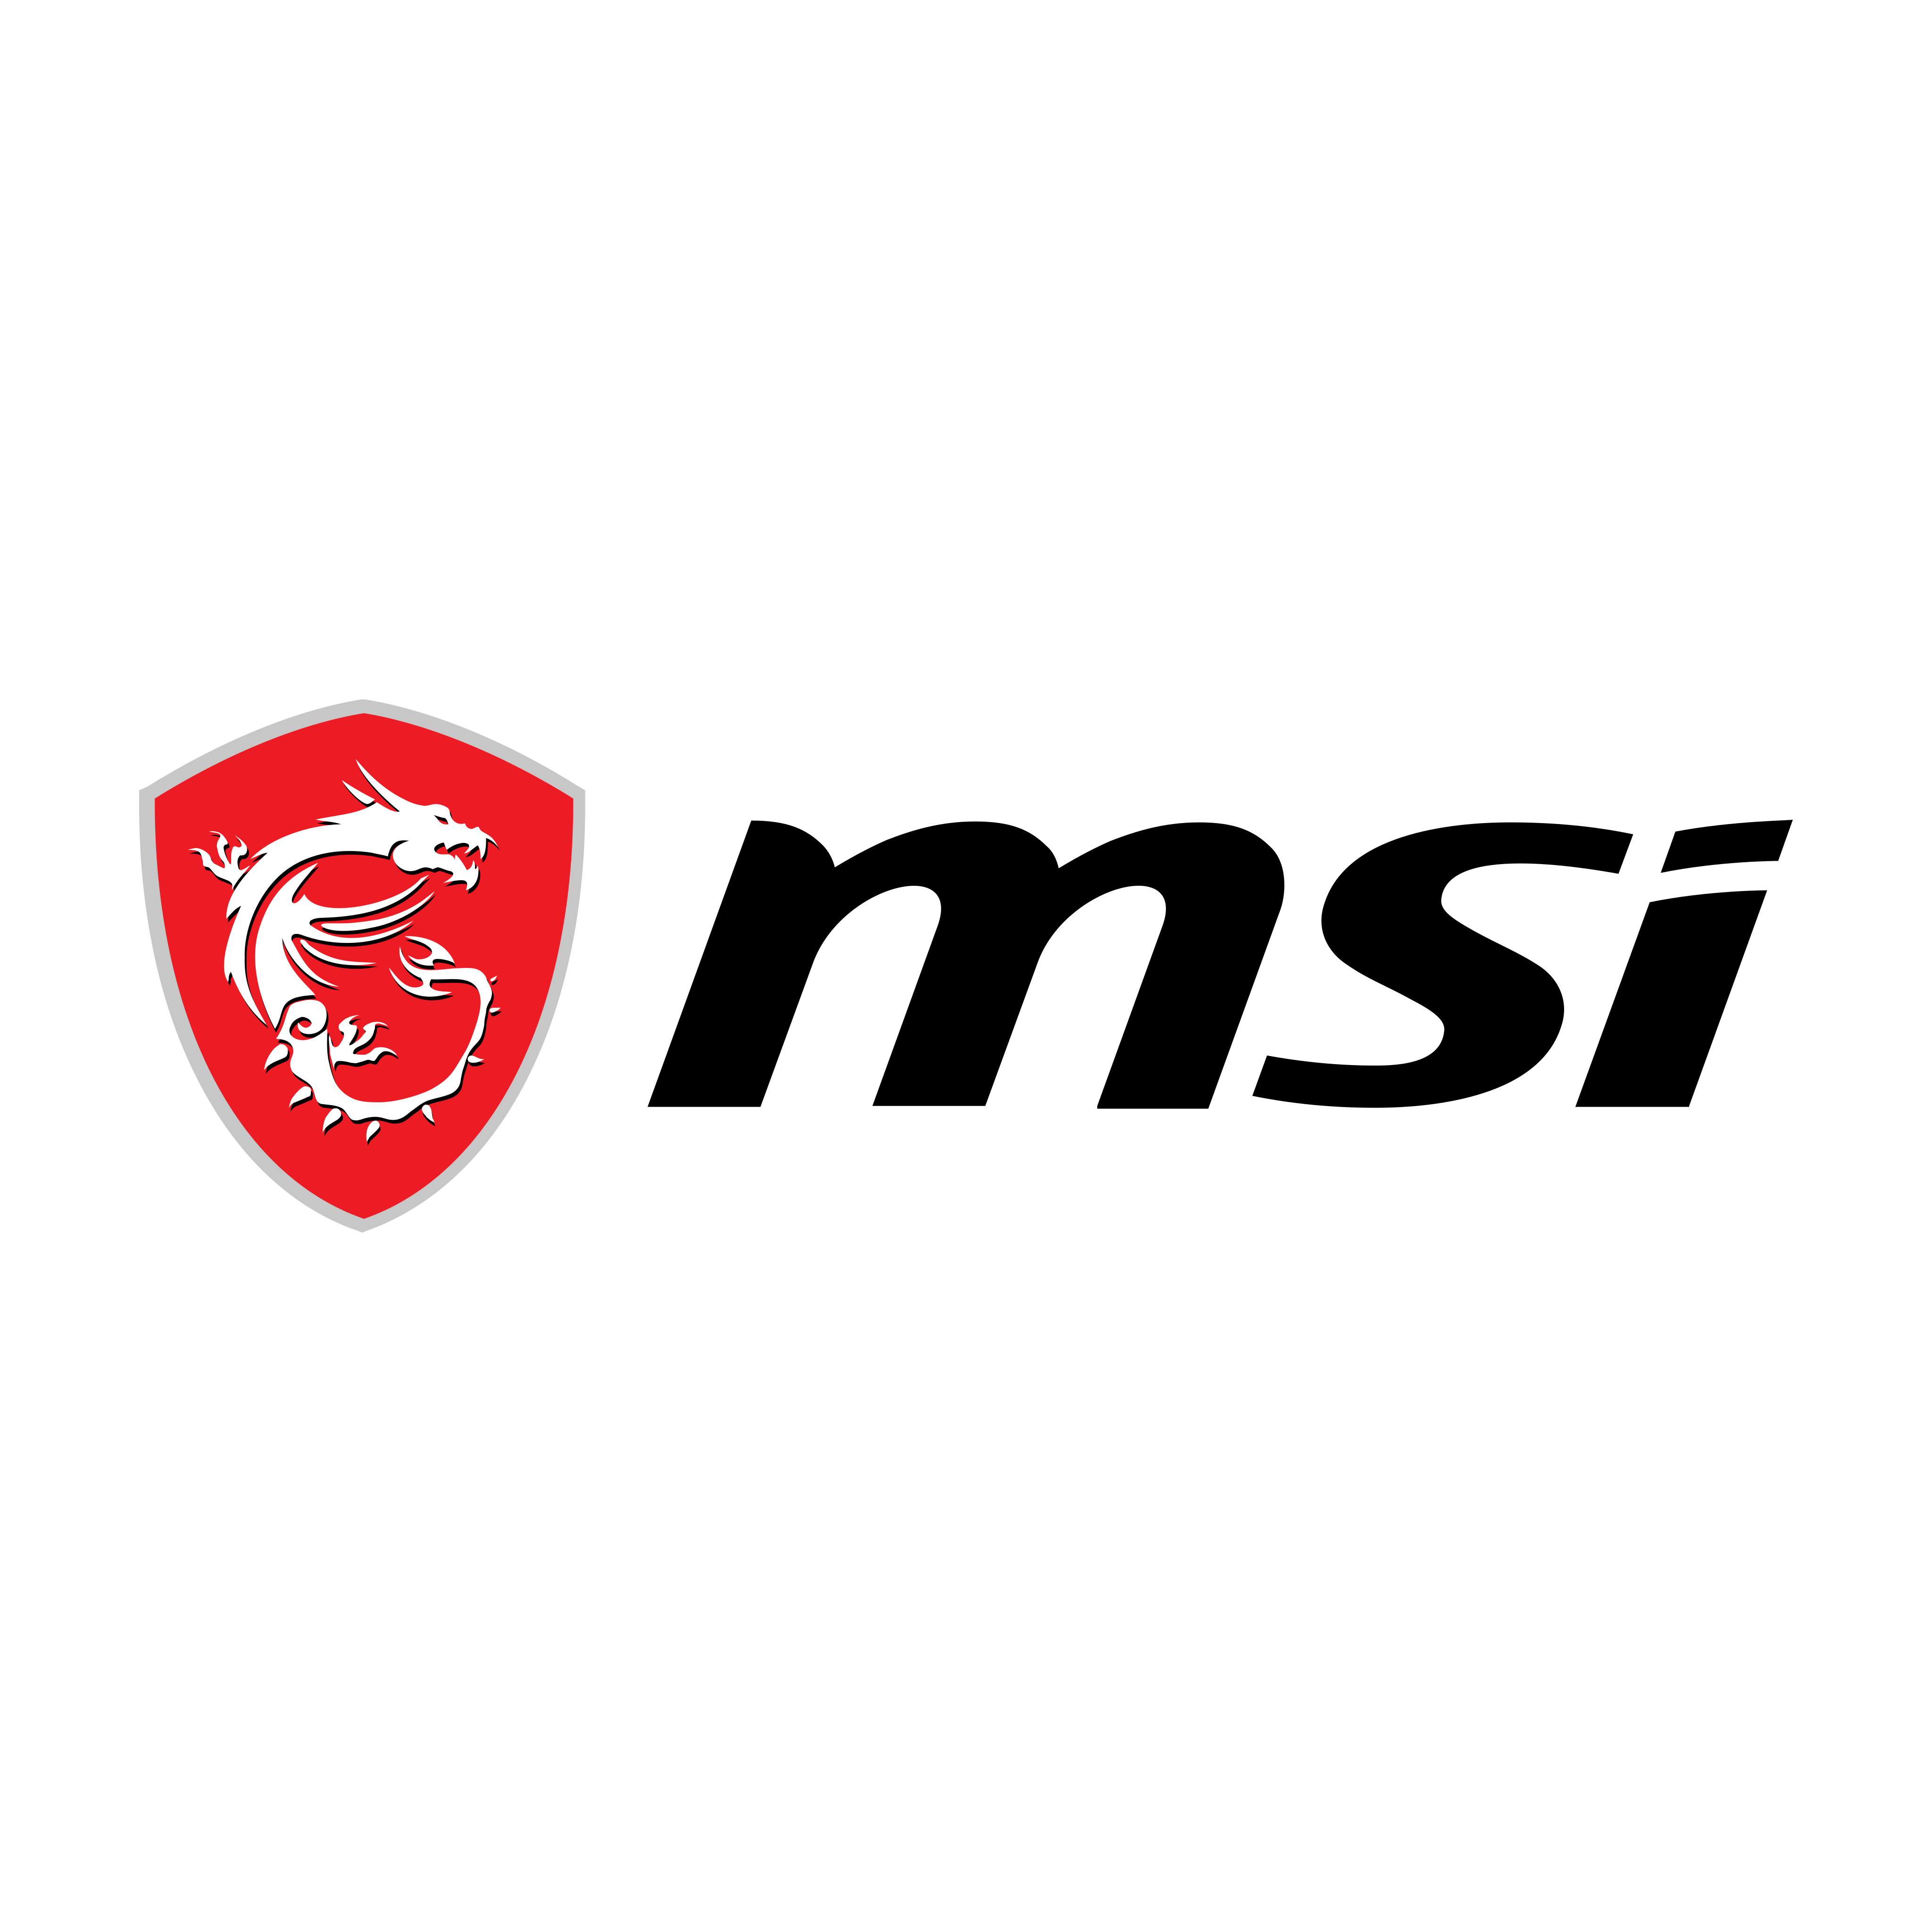 msi logo 0 - MSI Logo